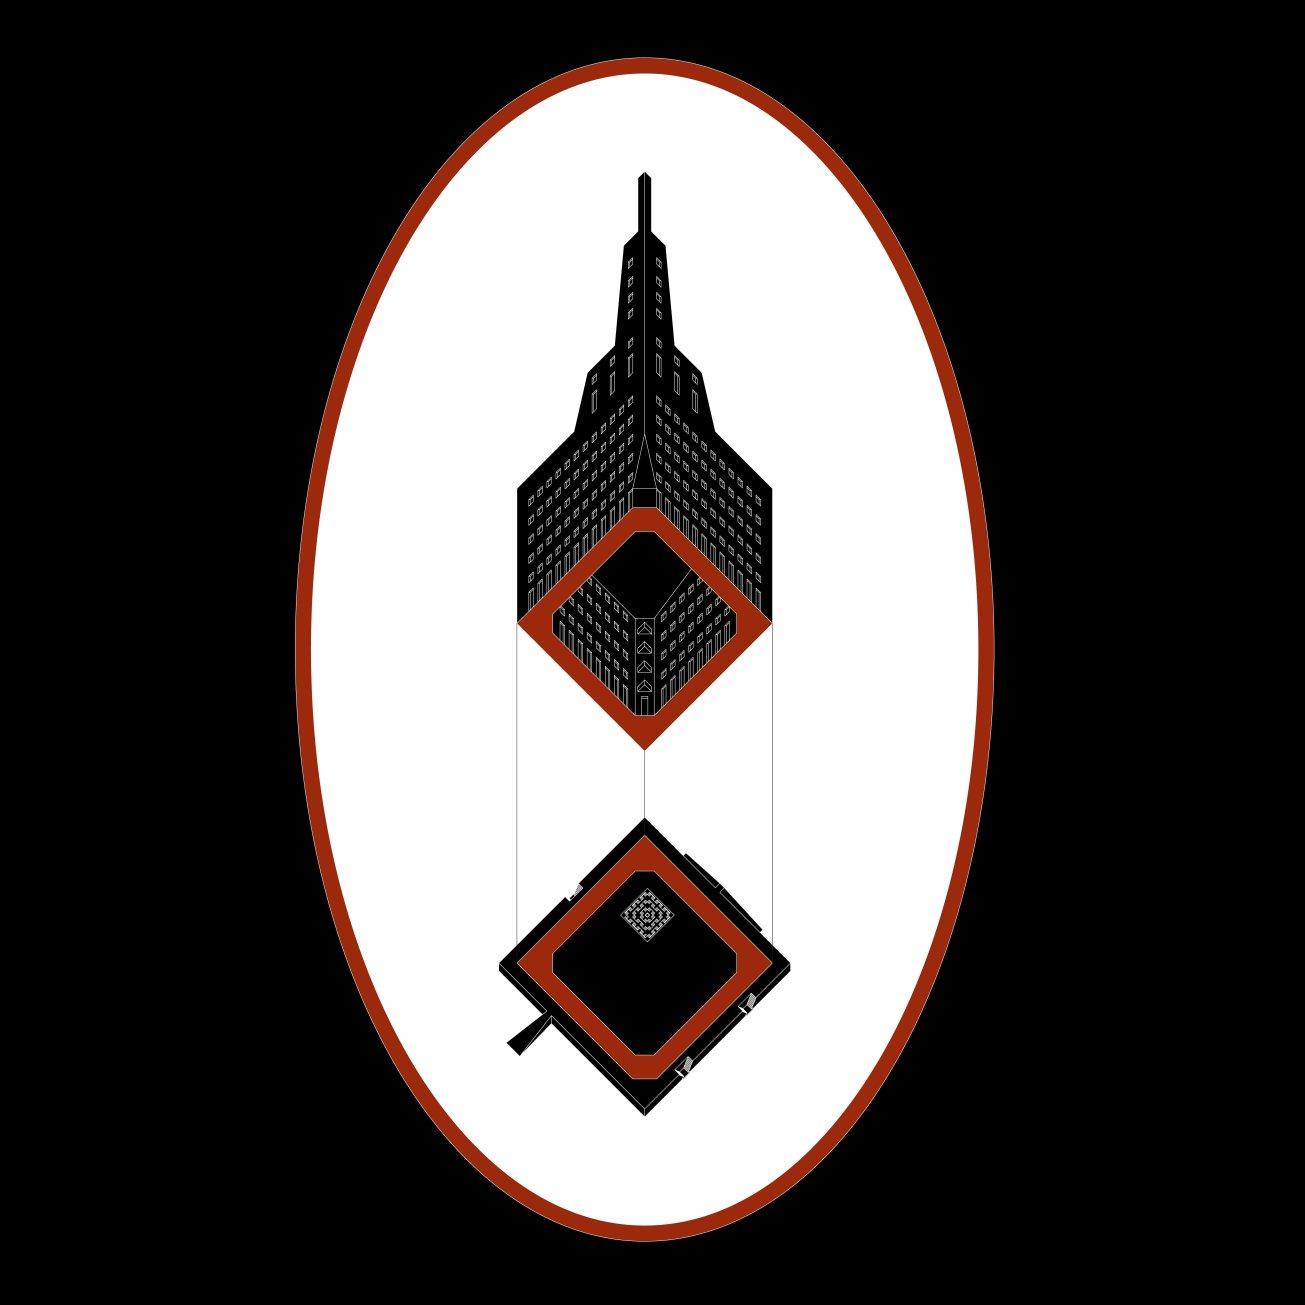 MONUMENTAL MARKET axon SAN ROCCO 02062016